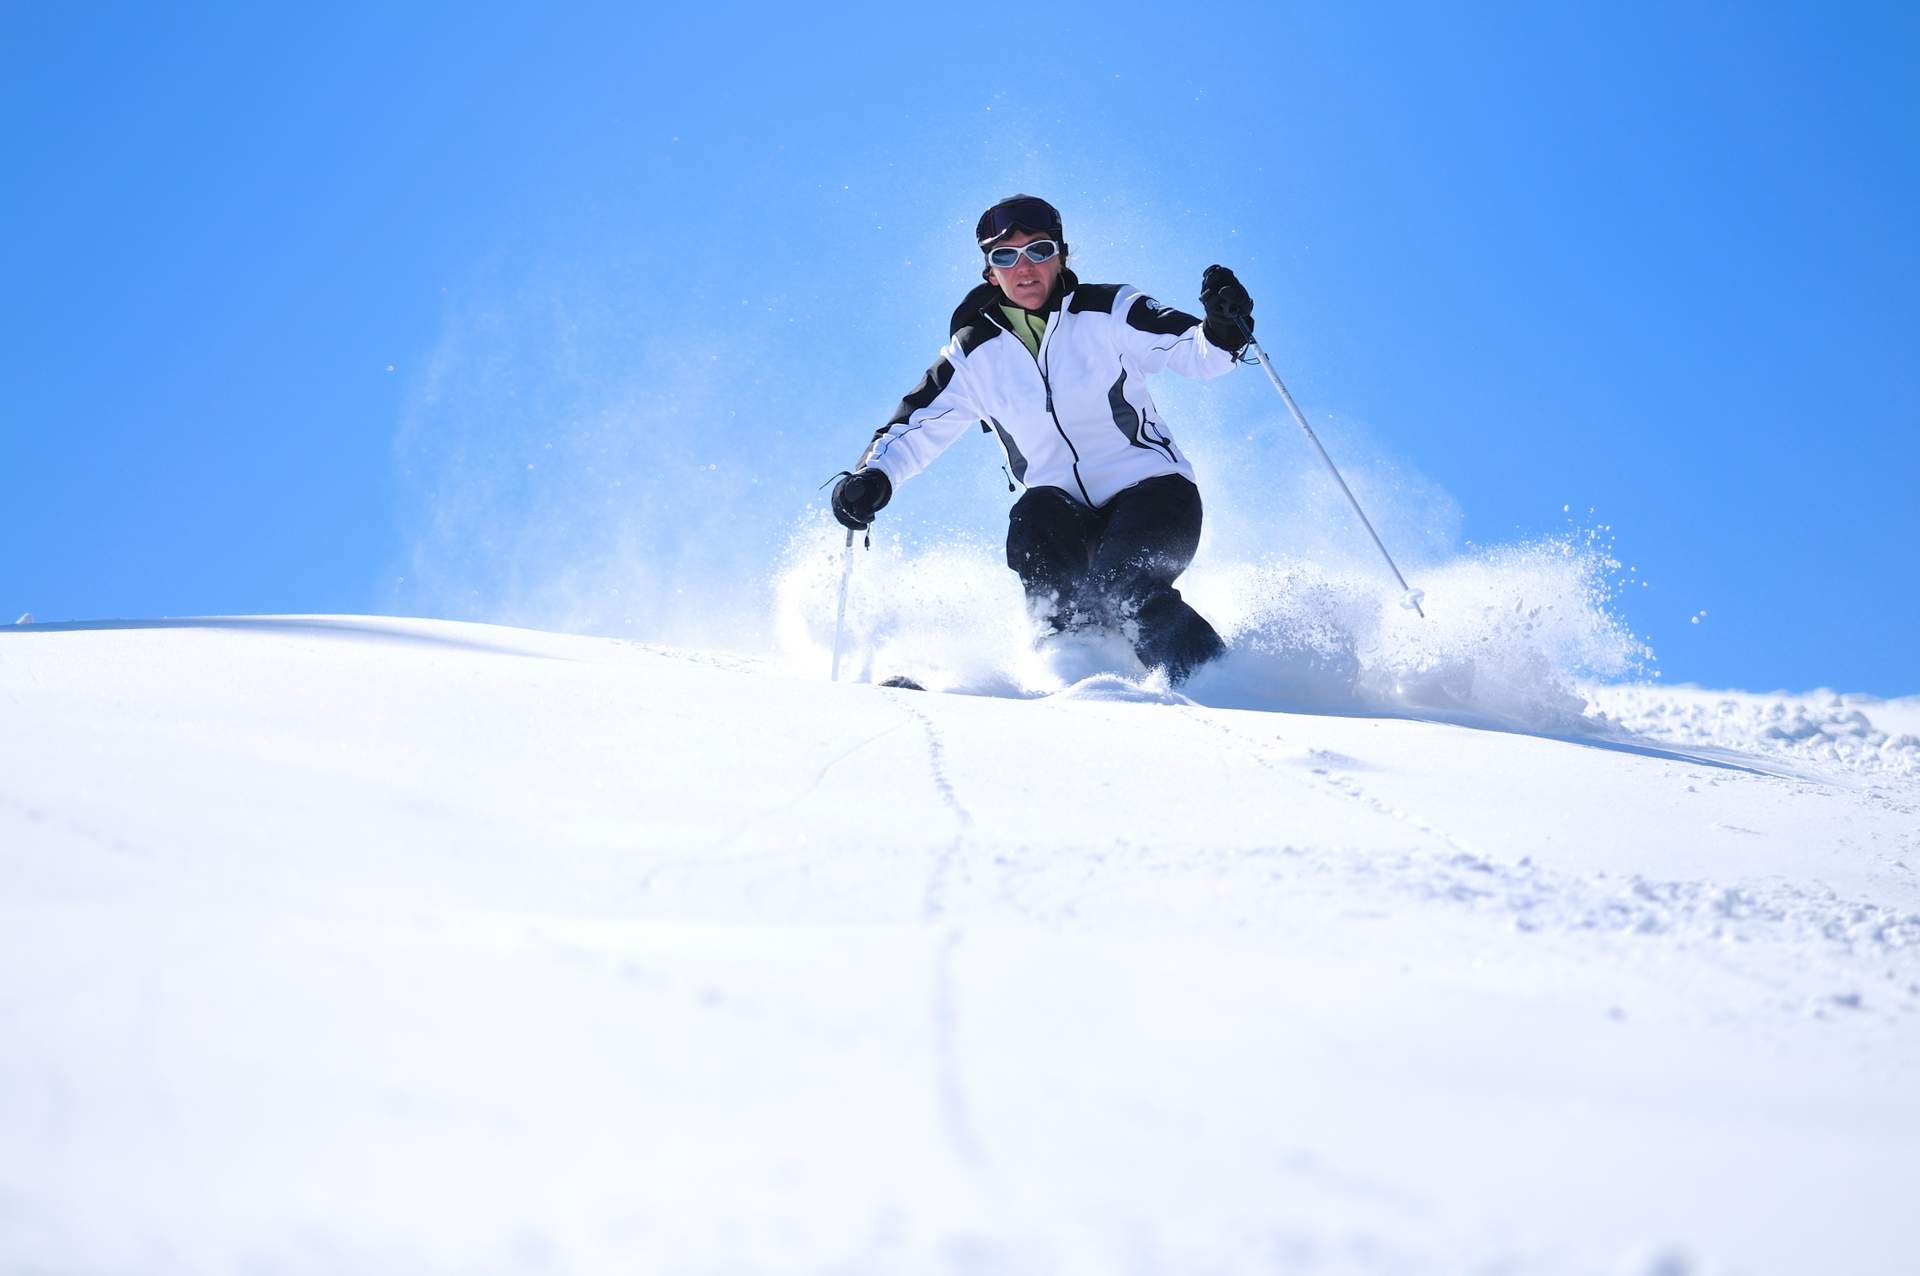 Park skiing easier to learn than snowboarding? - Ski ...